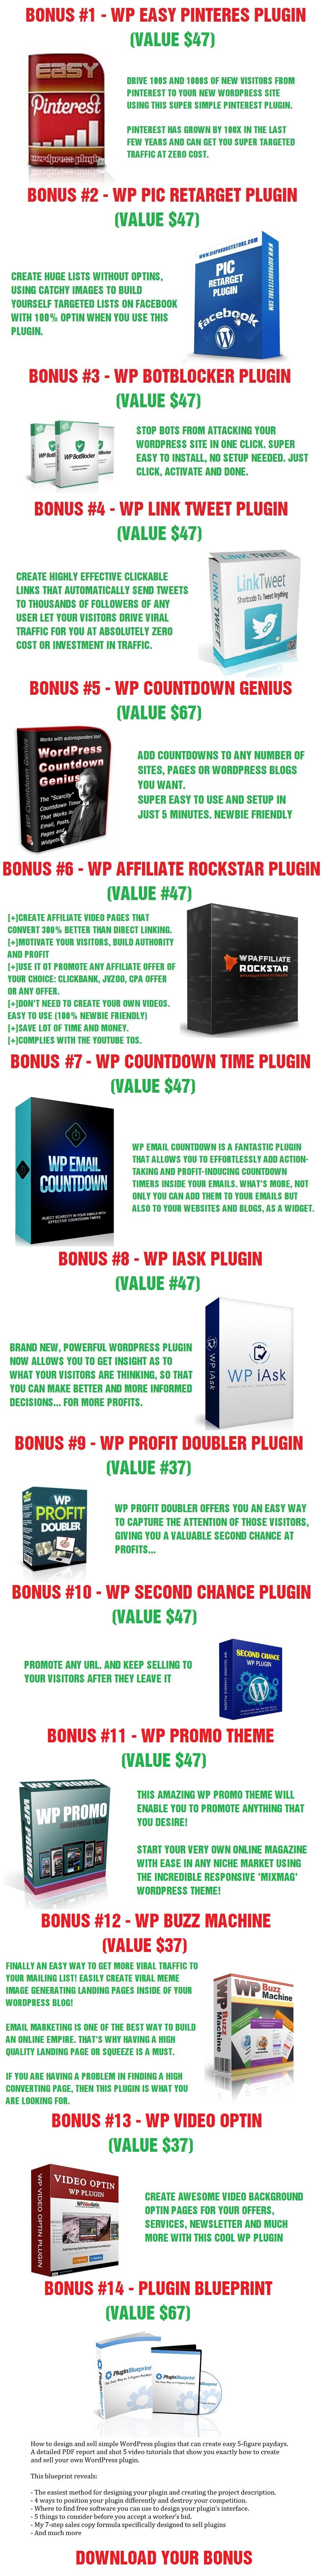 BlogFusion Bonus